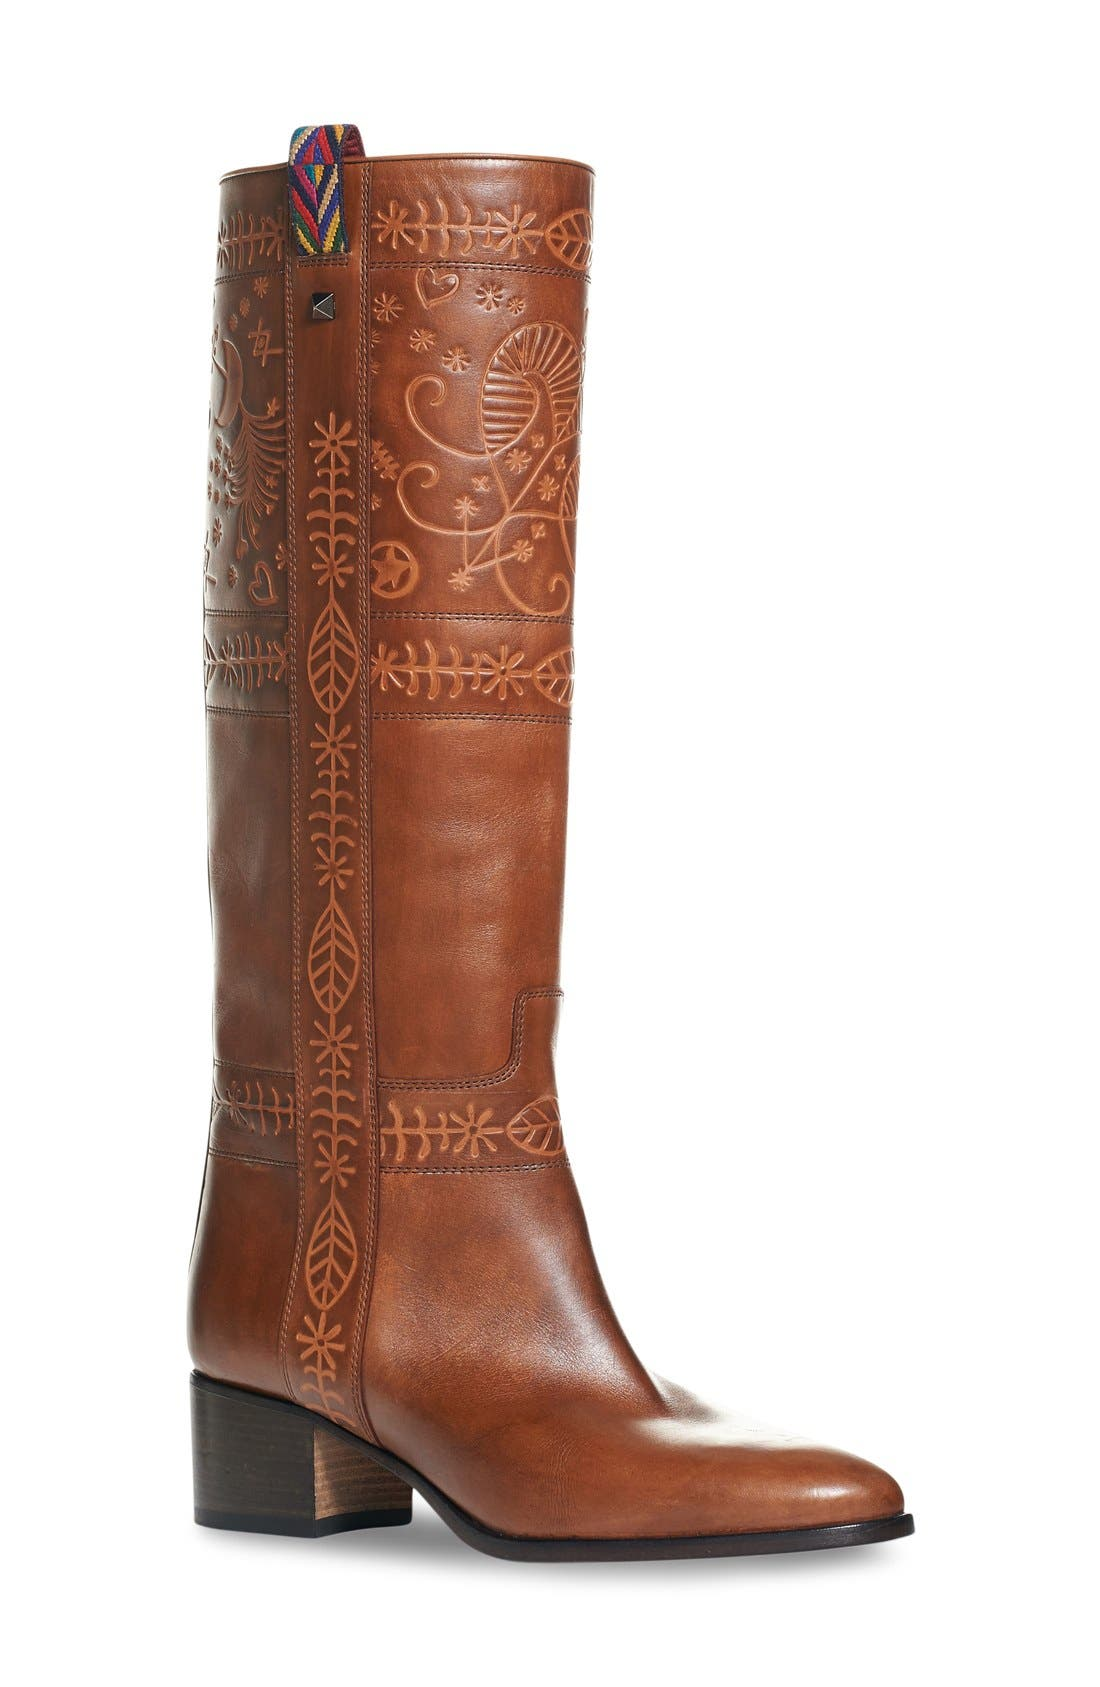 Main Image - Valentino 'Rockstud' Embossed Boot (Women)